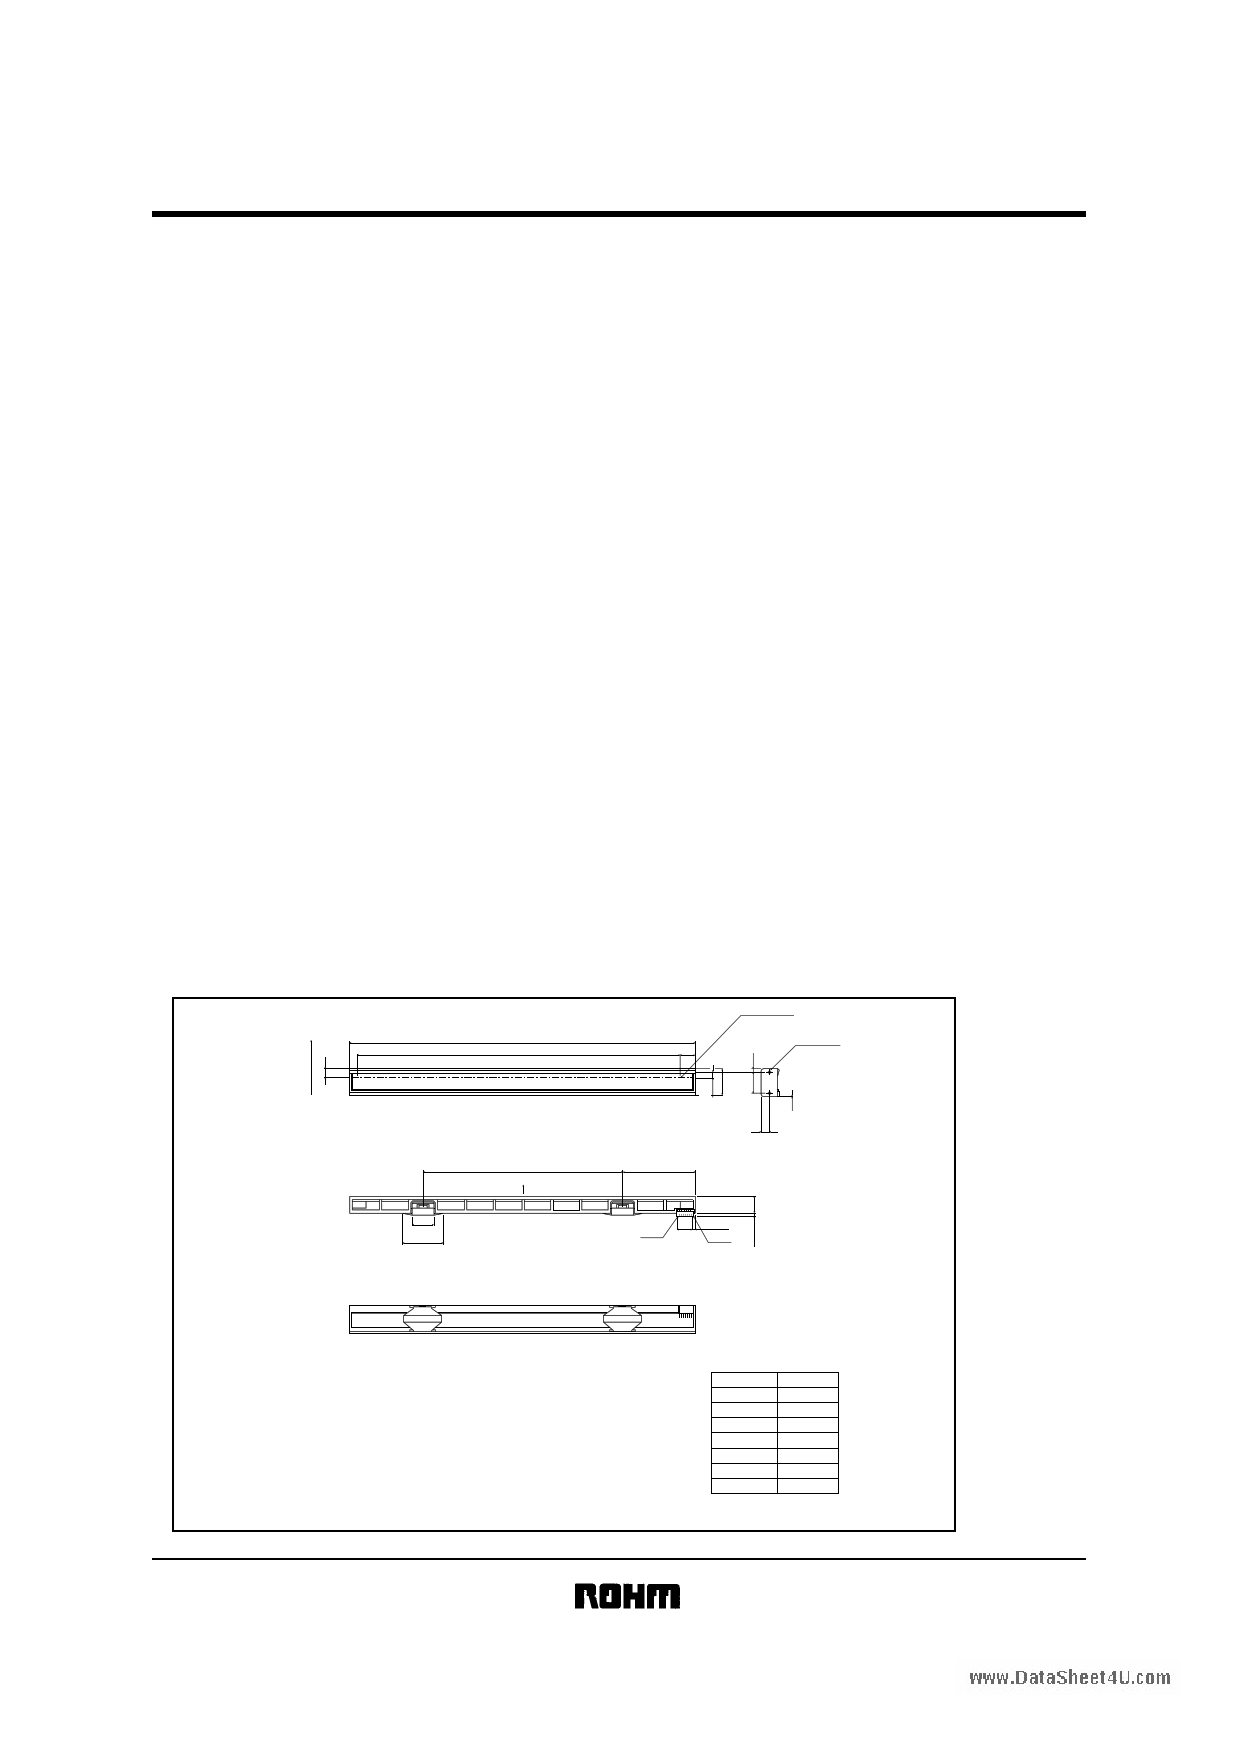 IA2008-MB20A datasheet